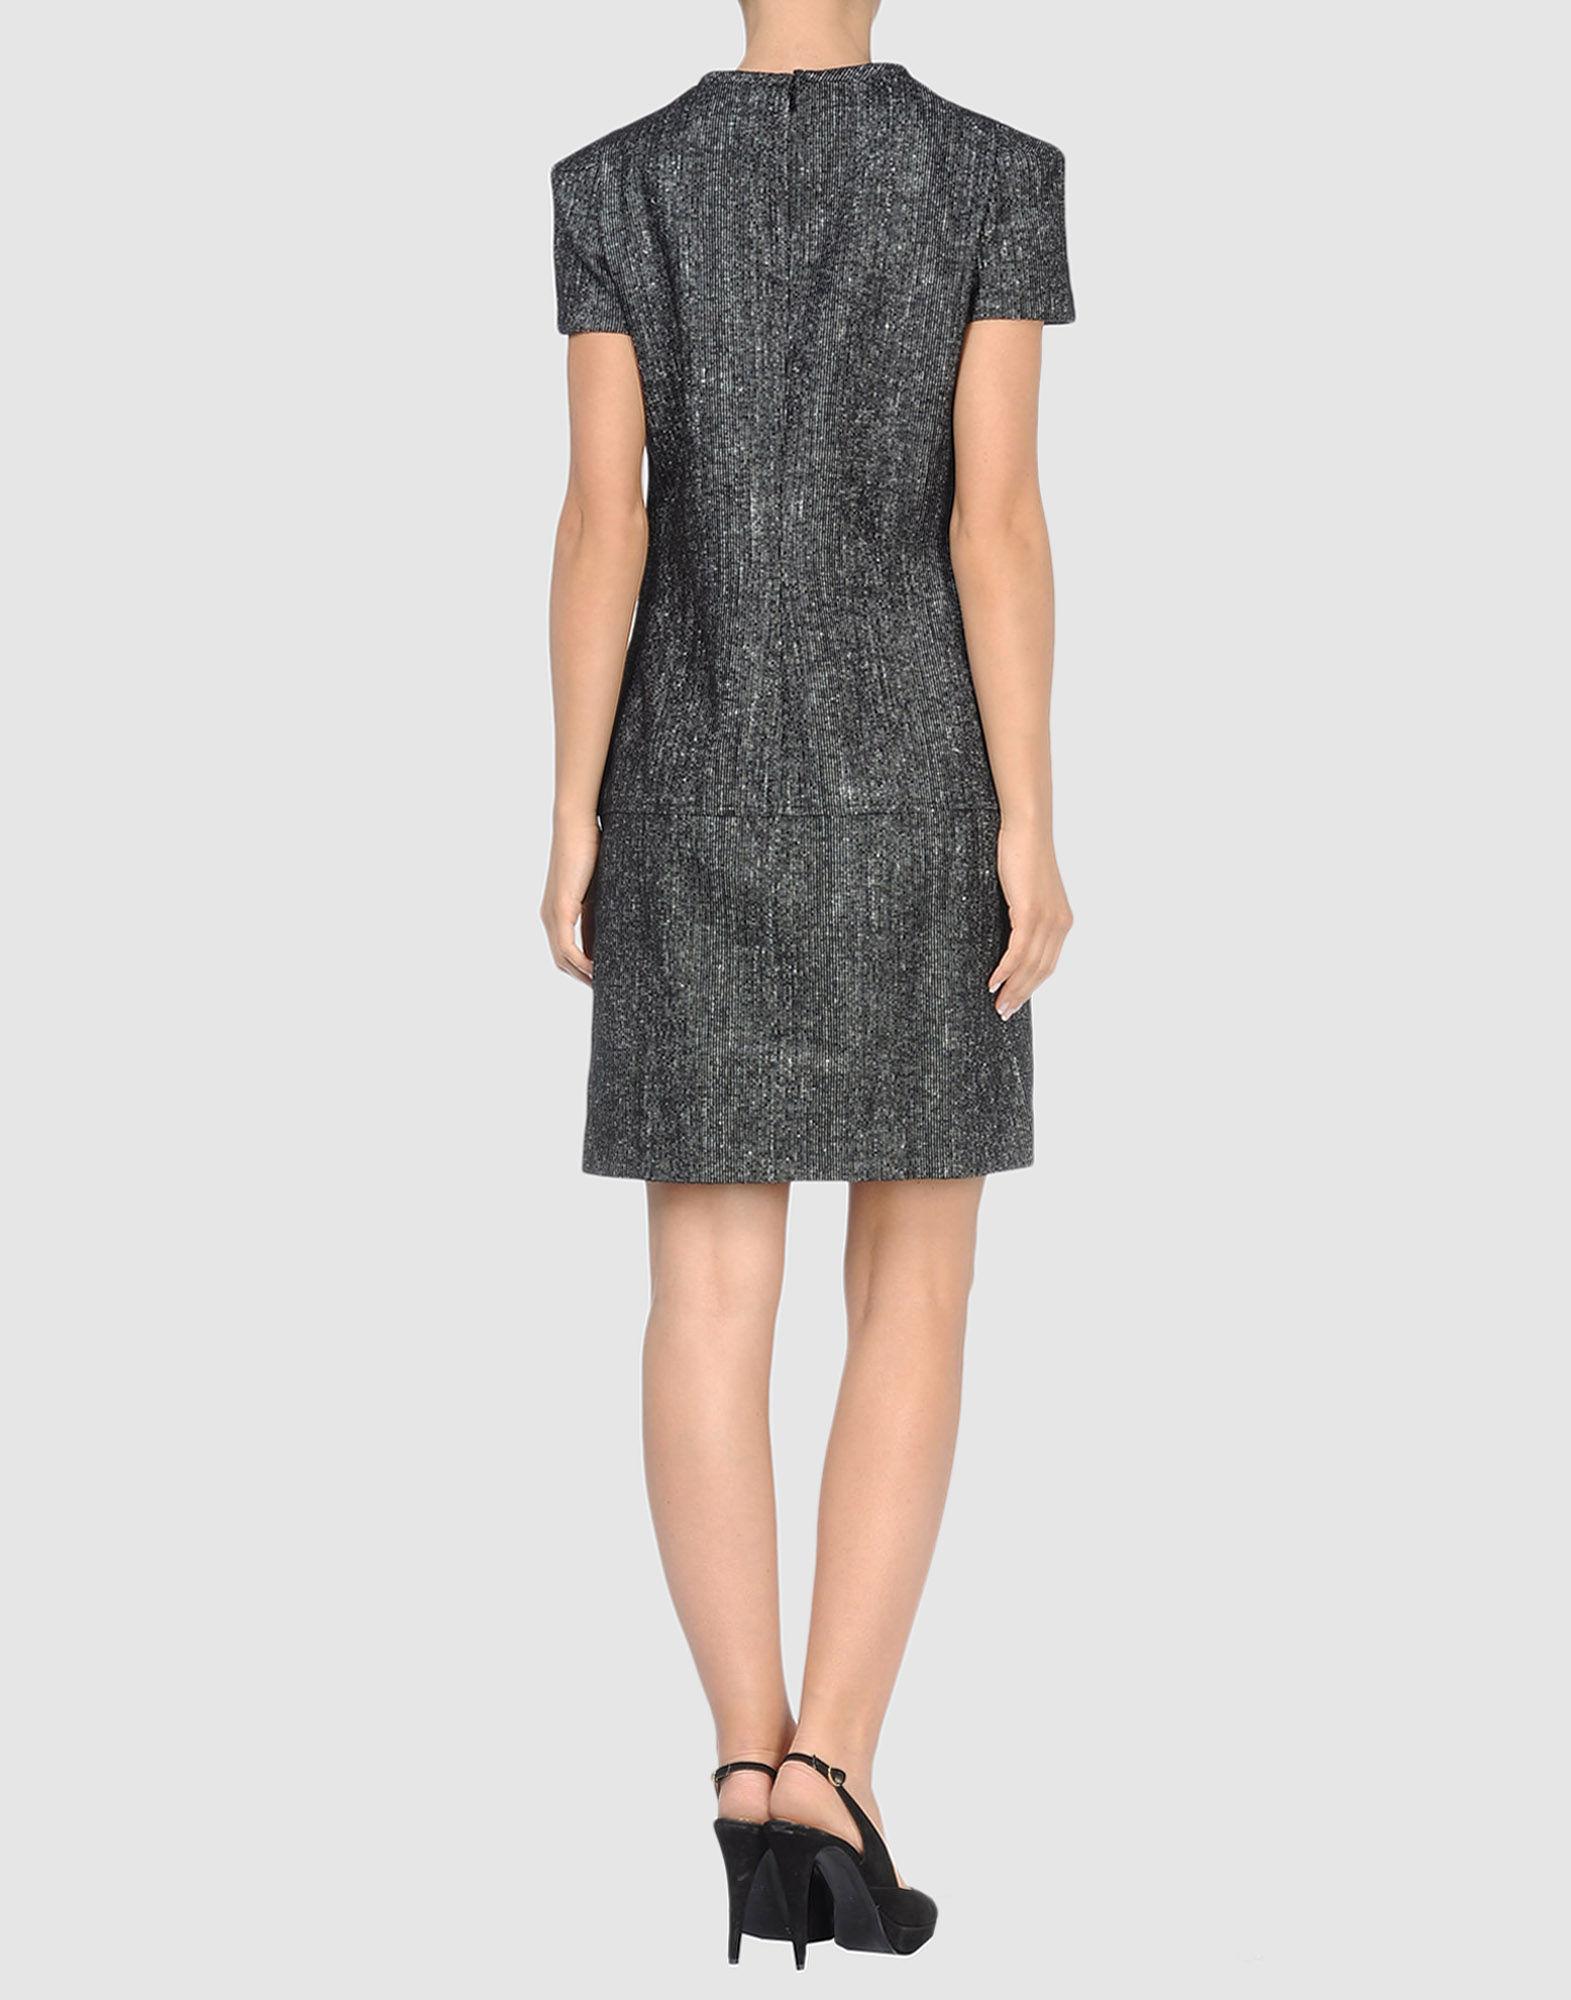 34225496TR 14 r - Evening Φορεματα Versace 2011 2012 Κωδ.20